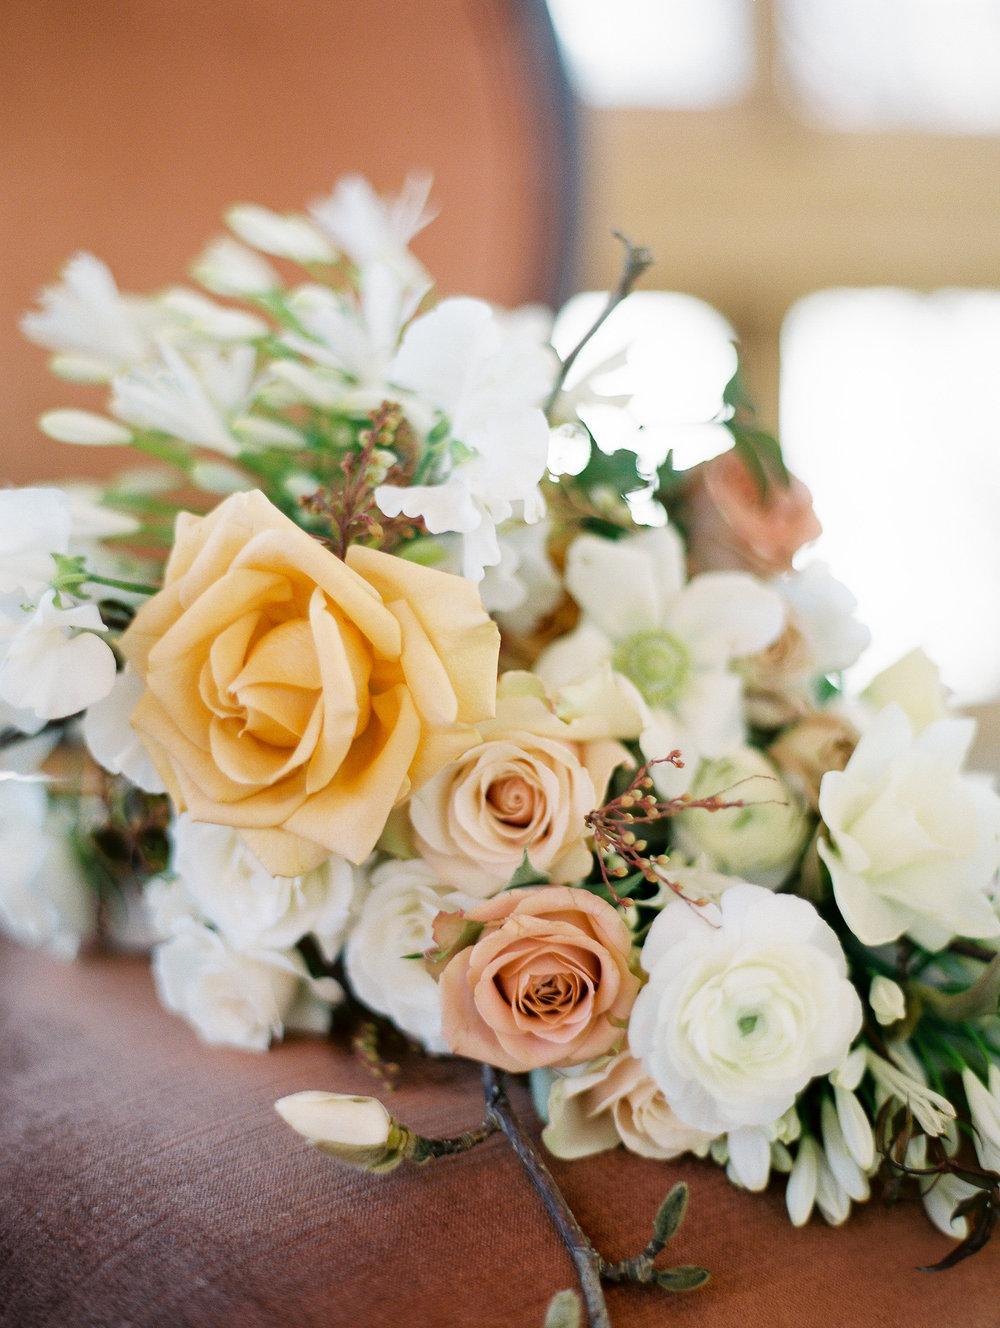 Dani-Cowan-Photography-Devils-Thumb-Ranch-Winter-Luxury-Wedding15.jpg